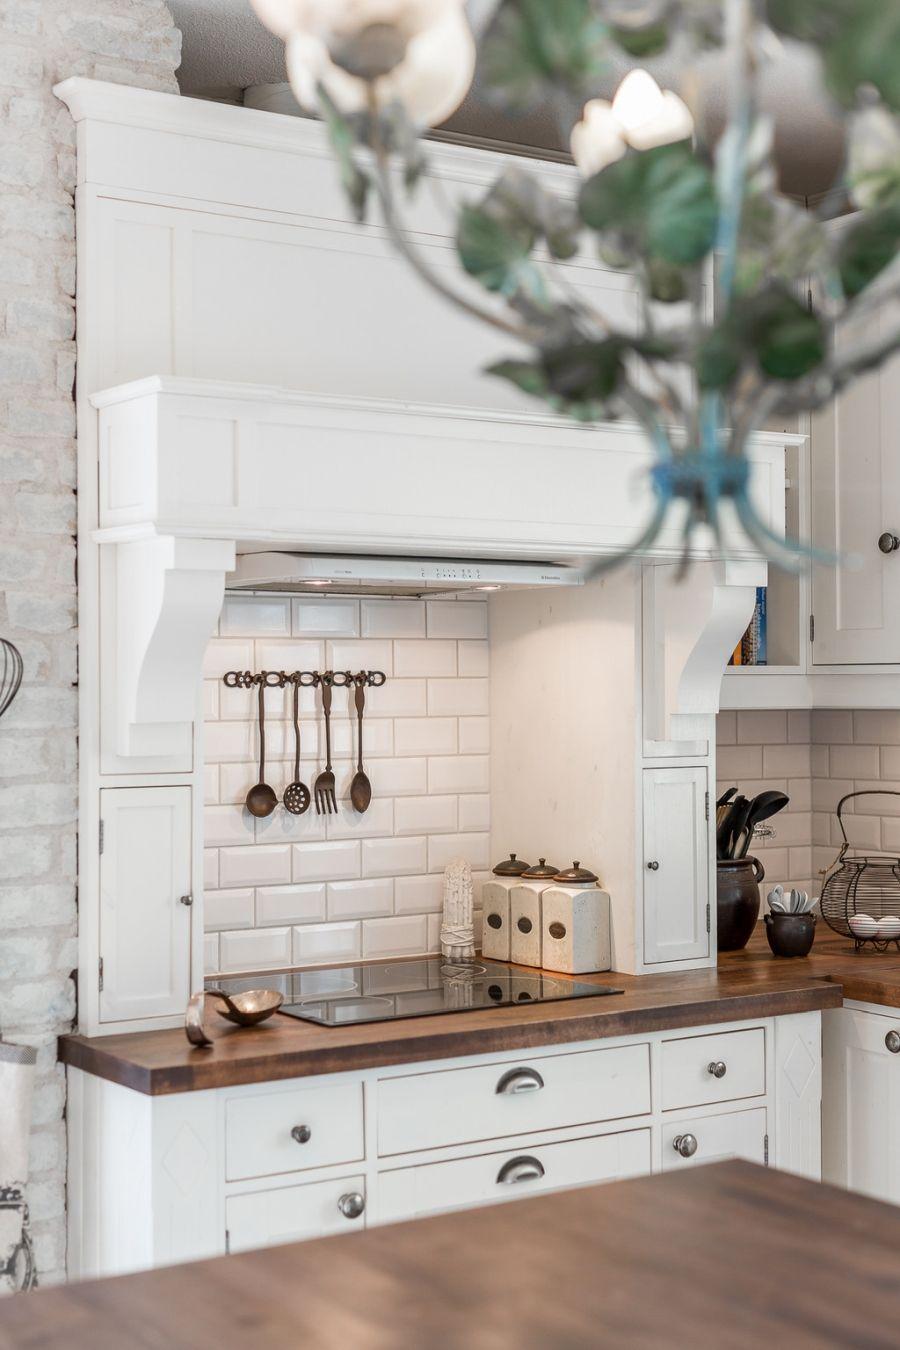 Pin On Dom Kuchnie